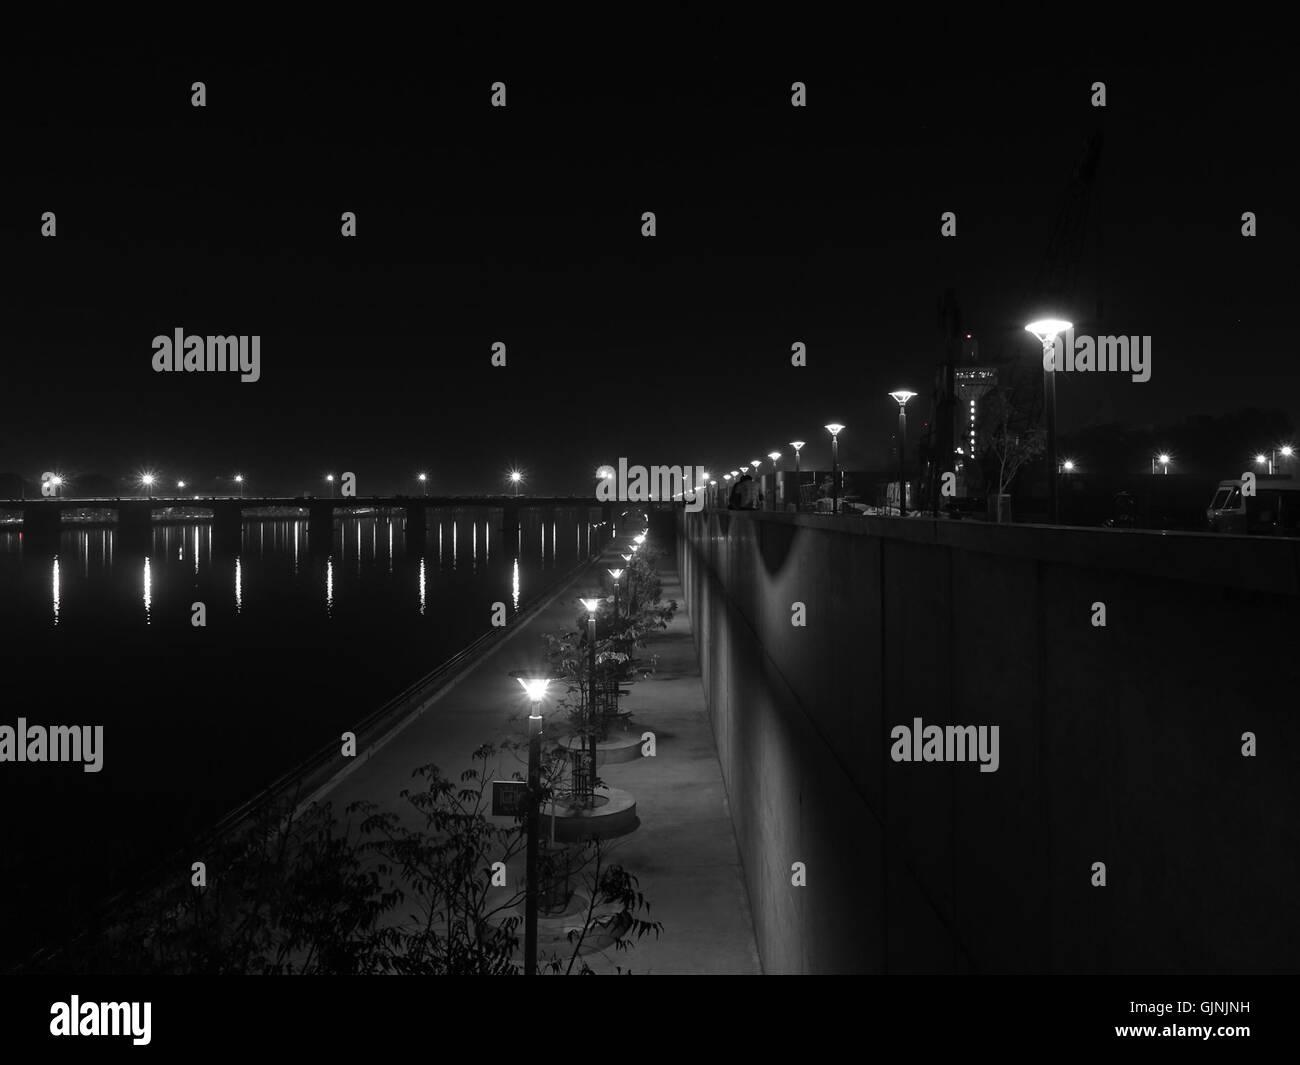 Sabarmati Riverfront in Ahmedabad - Stock Image